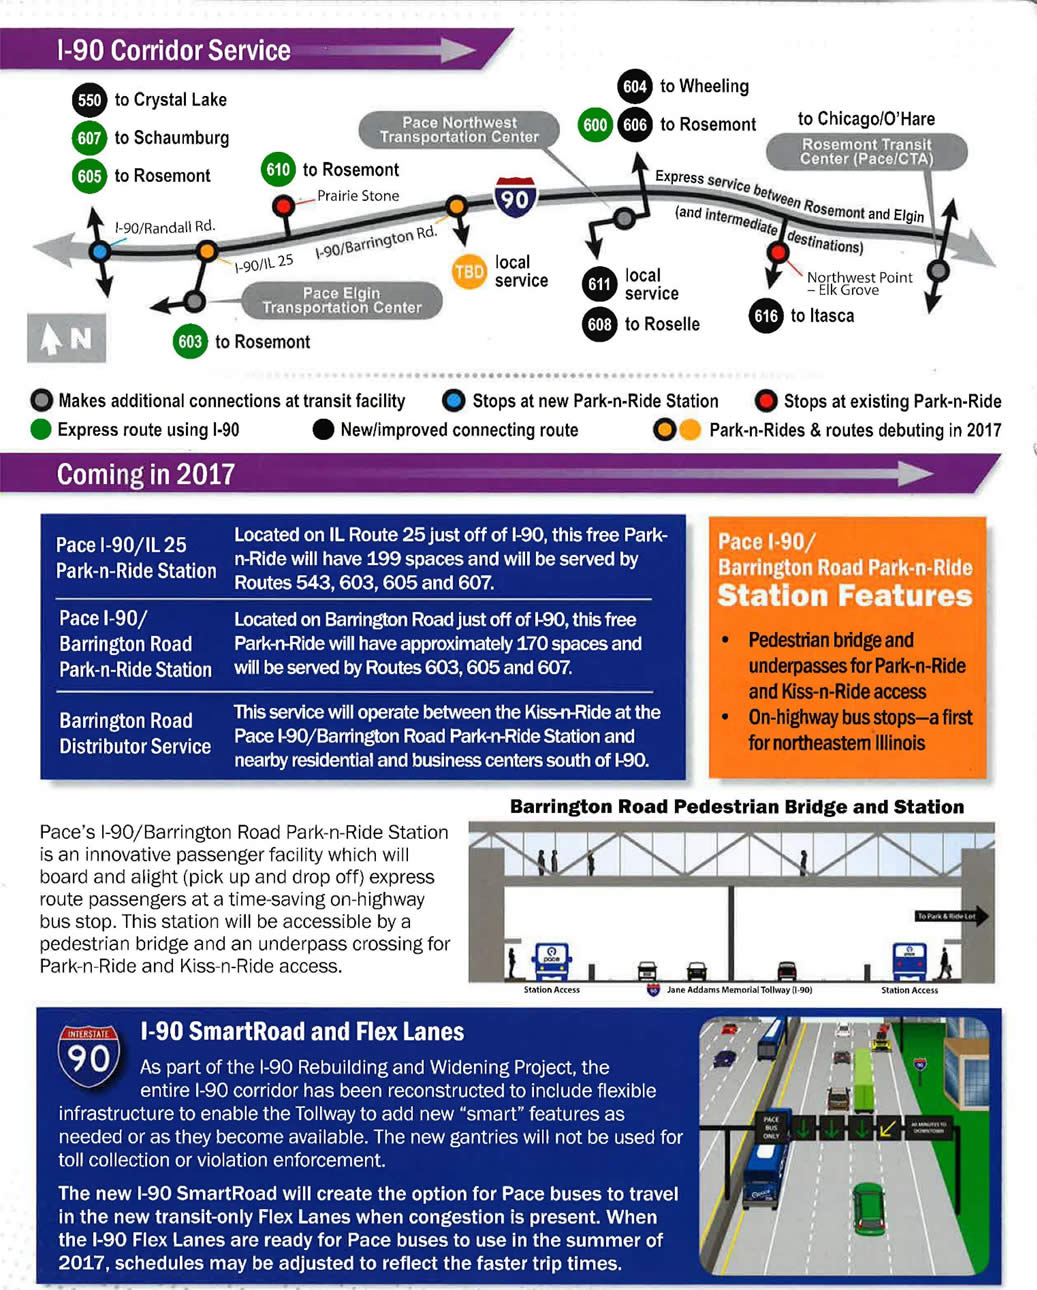 I-90 Corridor Service Coming in 2017